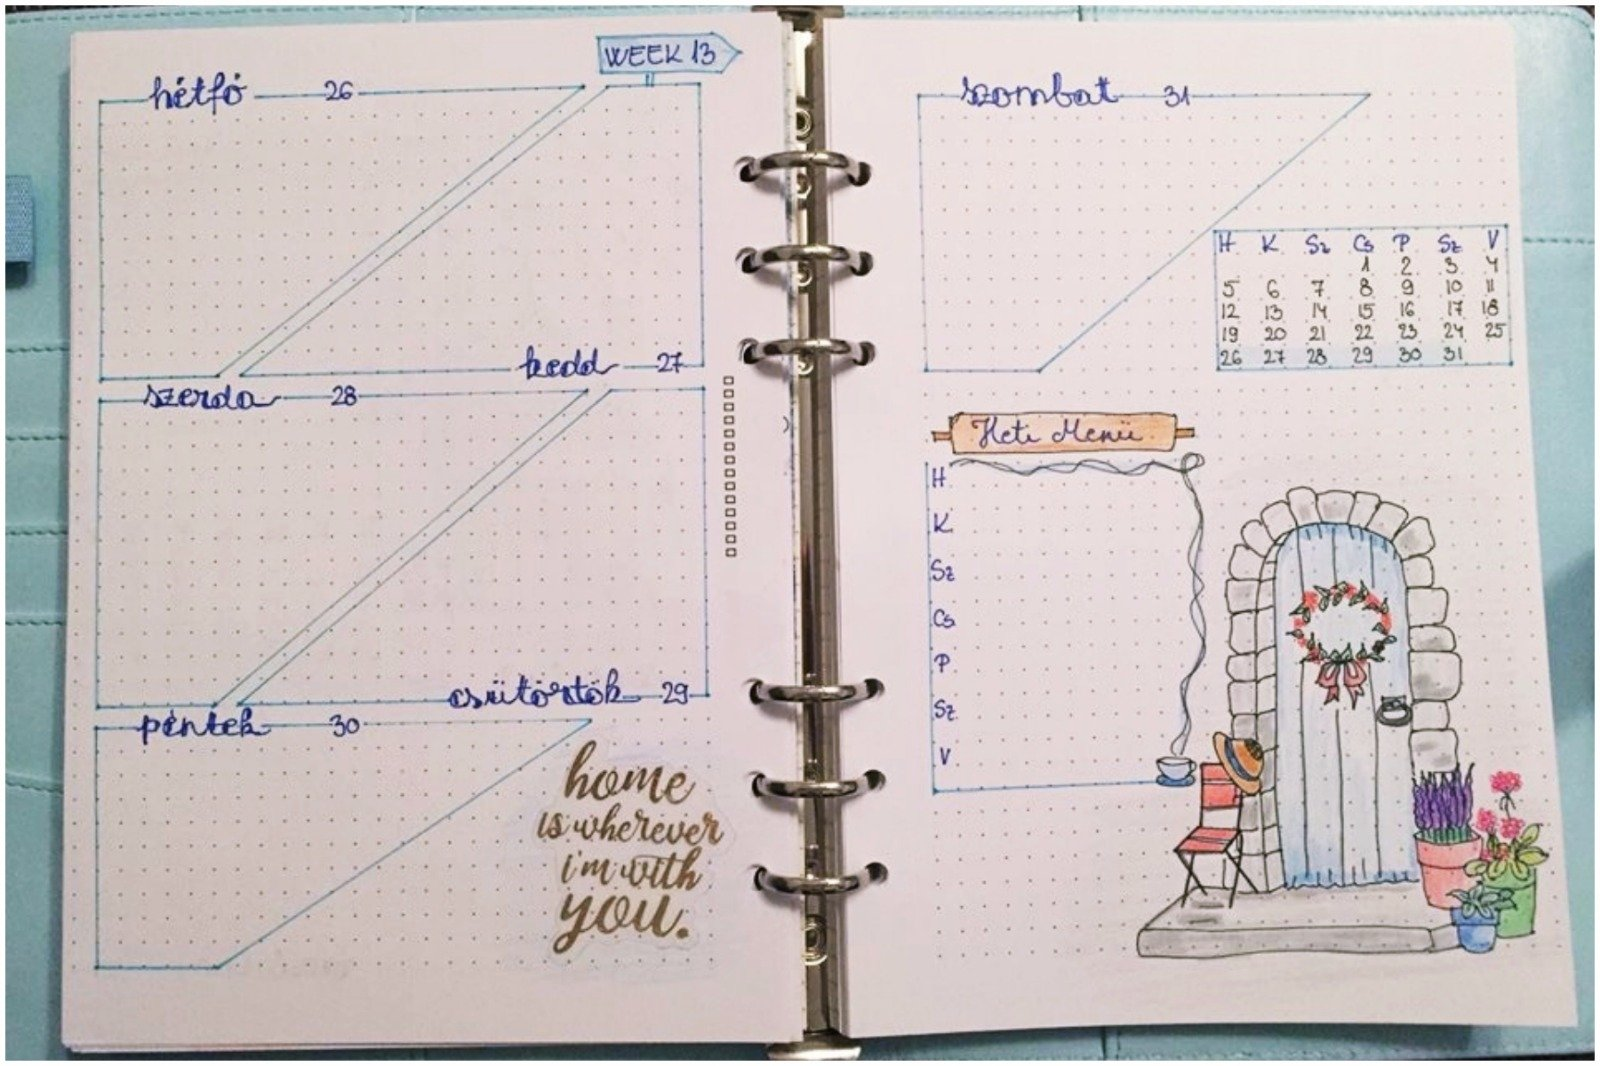 Bullet journal weekly planner - week 13 - itstartswithacoffee.com #march #coverpage #bulletjournal #bujo #weekly #weeklyplanner #bulletjournaling #bujojunkies #bujolove #showmeyourplanner #bujoinspire #bulletjournallove #bulletjournalcommunity #planning #planneraddict #bulletjournaljunkies #planwithme #itstartswithacoffee.com